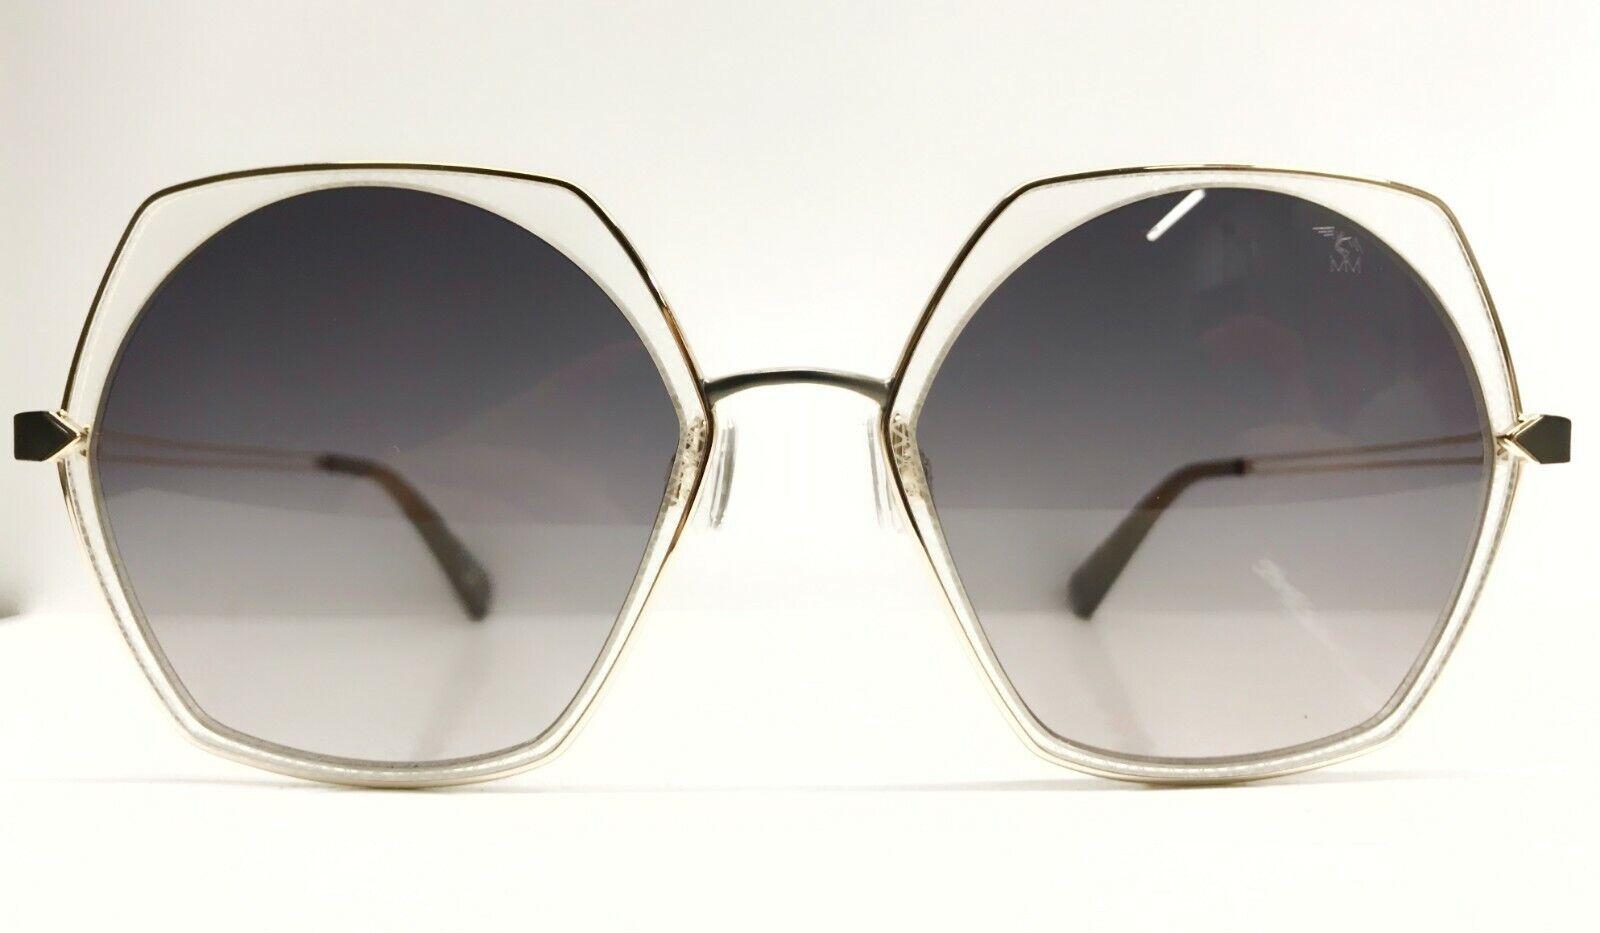 NEW Mollerus Gendarme c.2 mit Etui SonnenbrillenSunglassesI